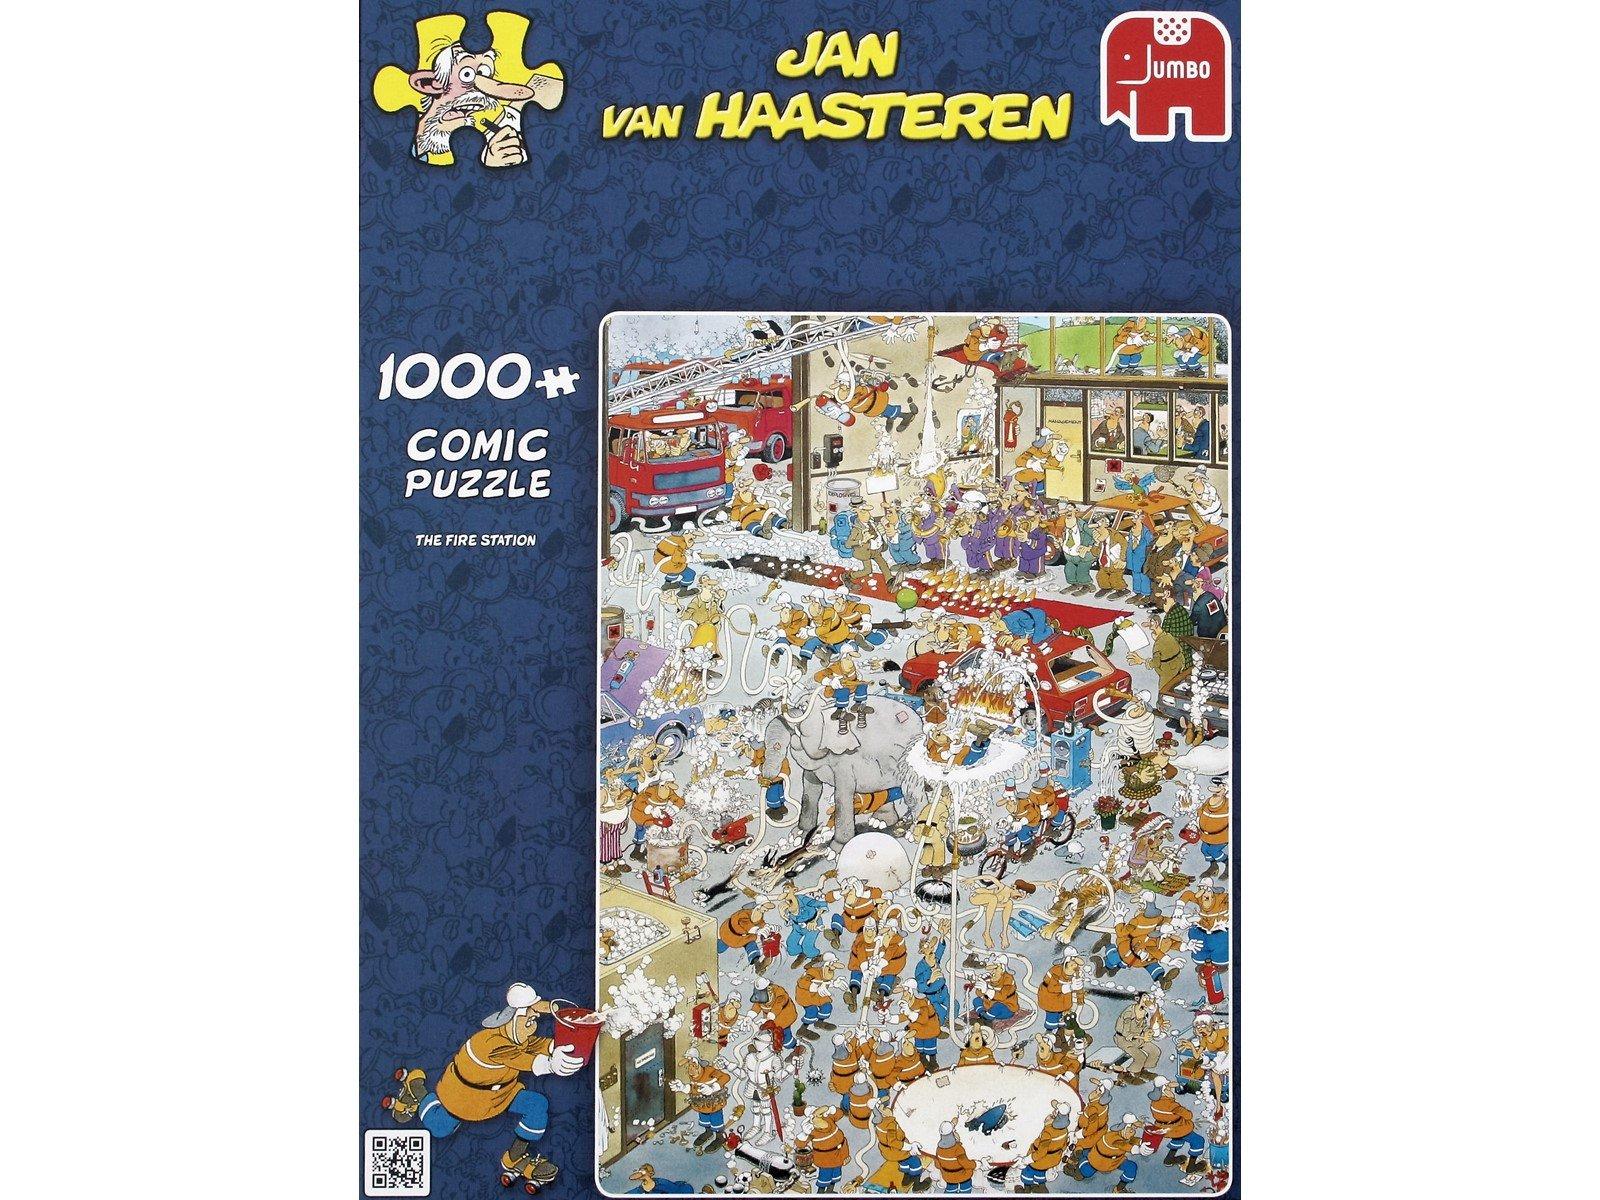 Jan Van Haasteren - The Fire Station - 1000 Piece Puzzle (81453H)